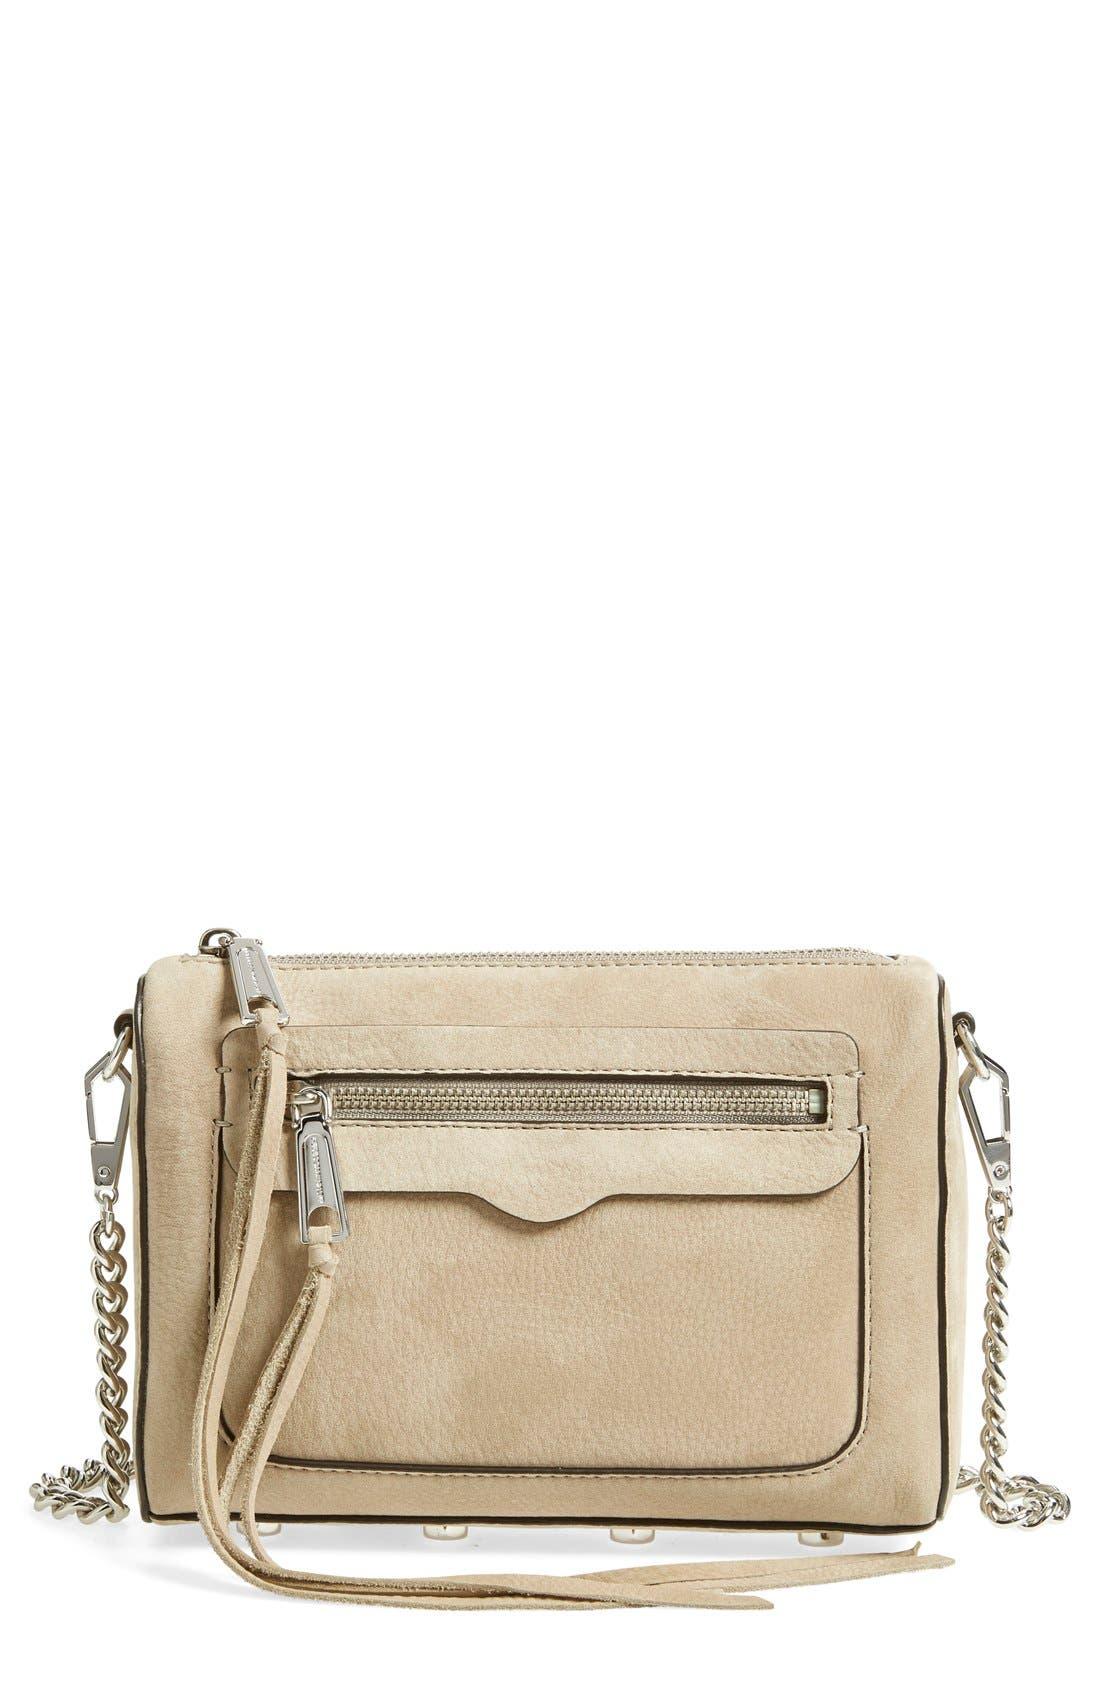 Main Image - Rebecca Minkoff 'Avery' Crossbody Bag